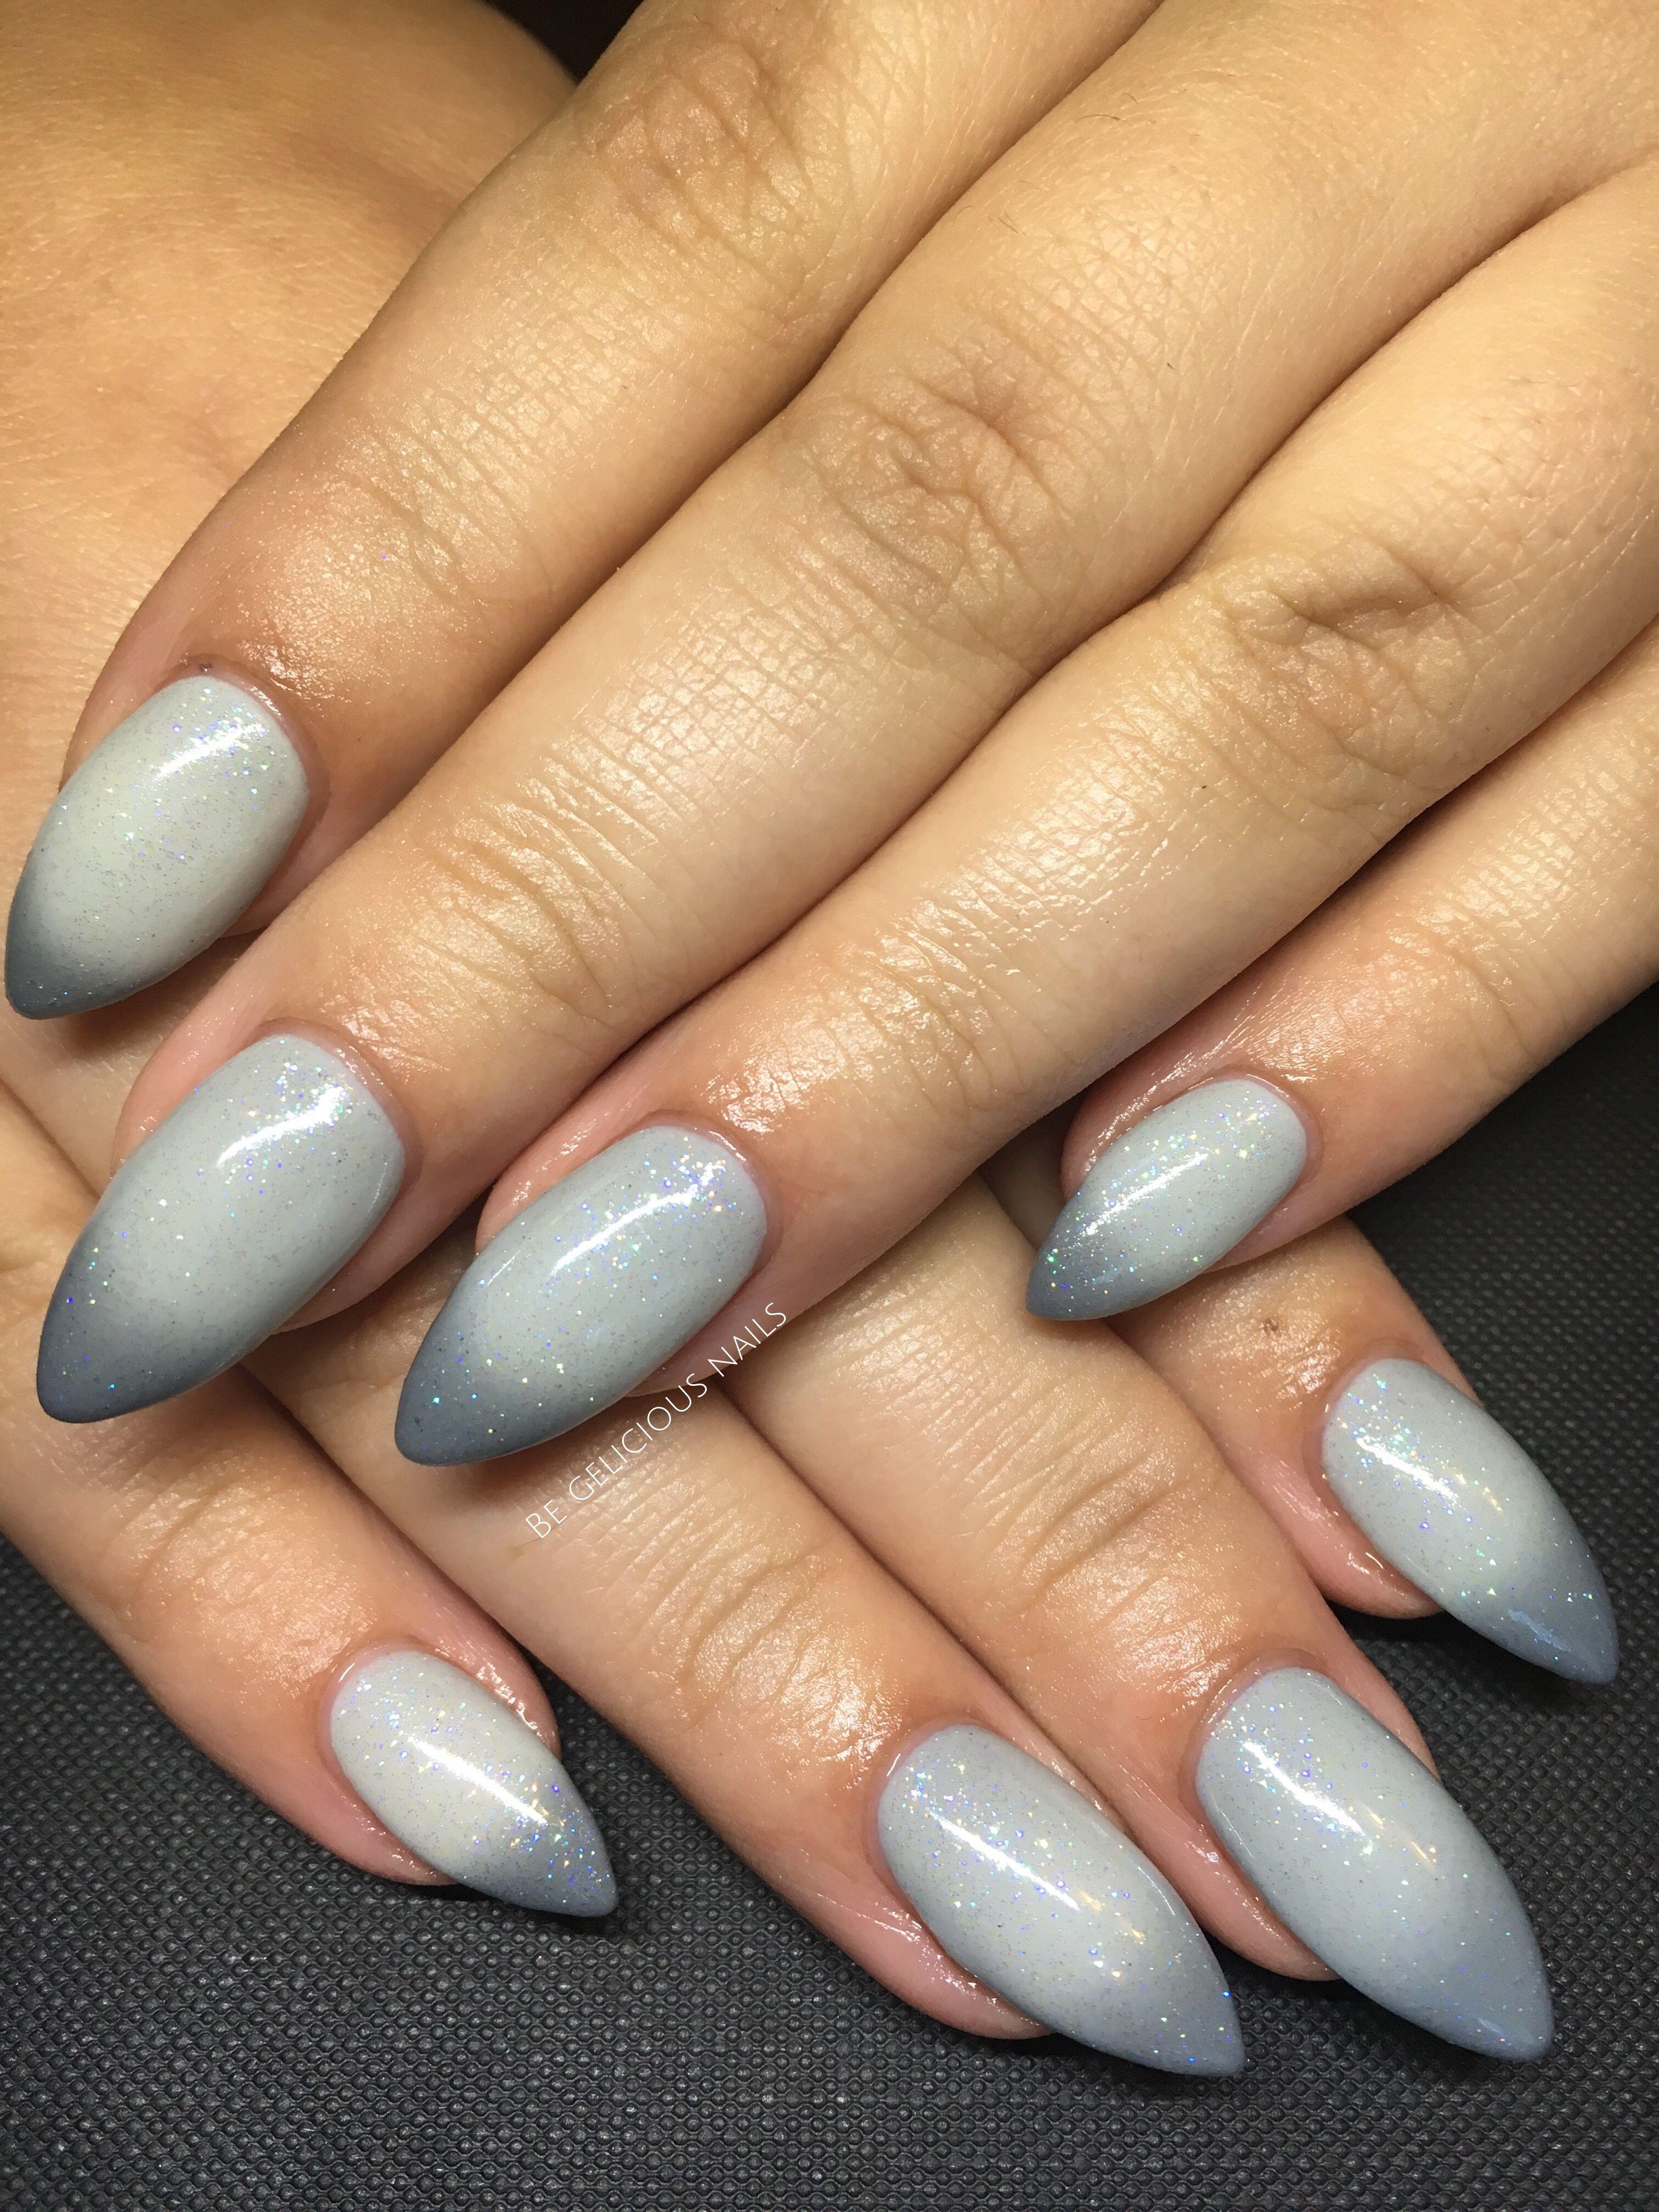 Calgel Nails, Ombr , Grey, Nail Art, Nail Design, Glitter,